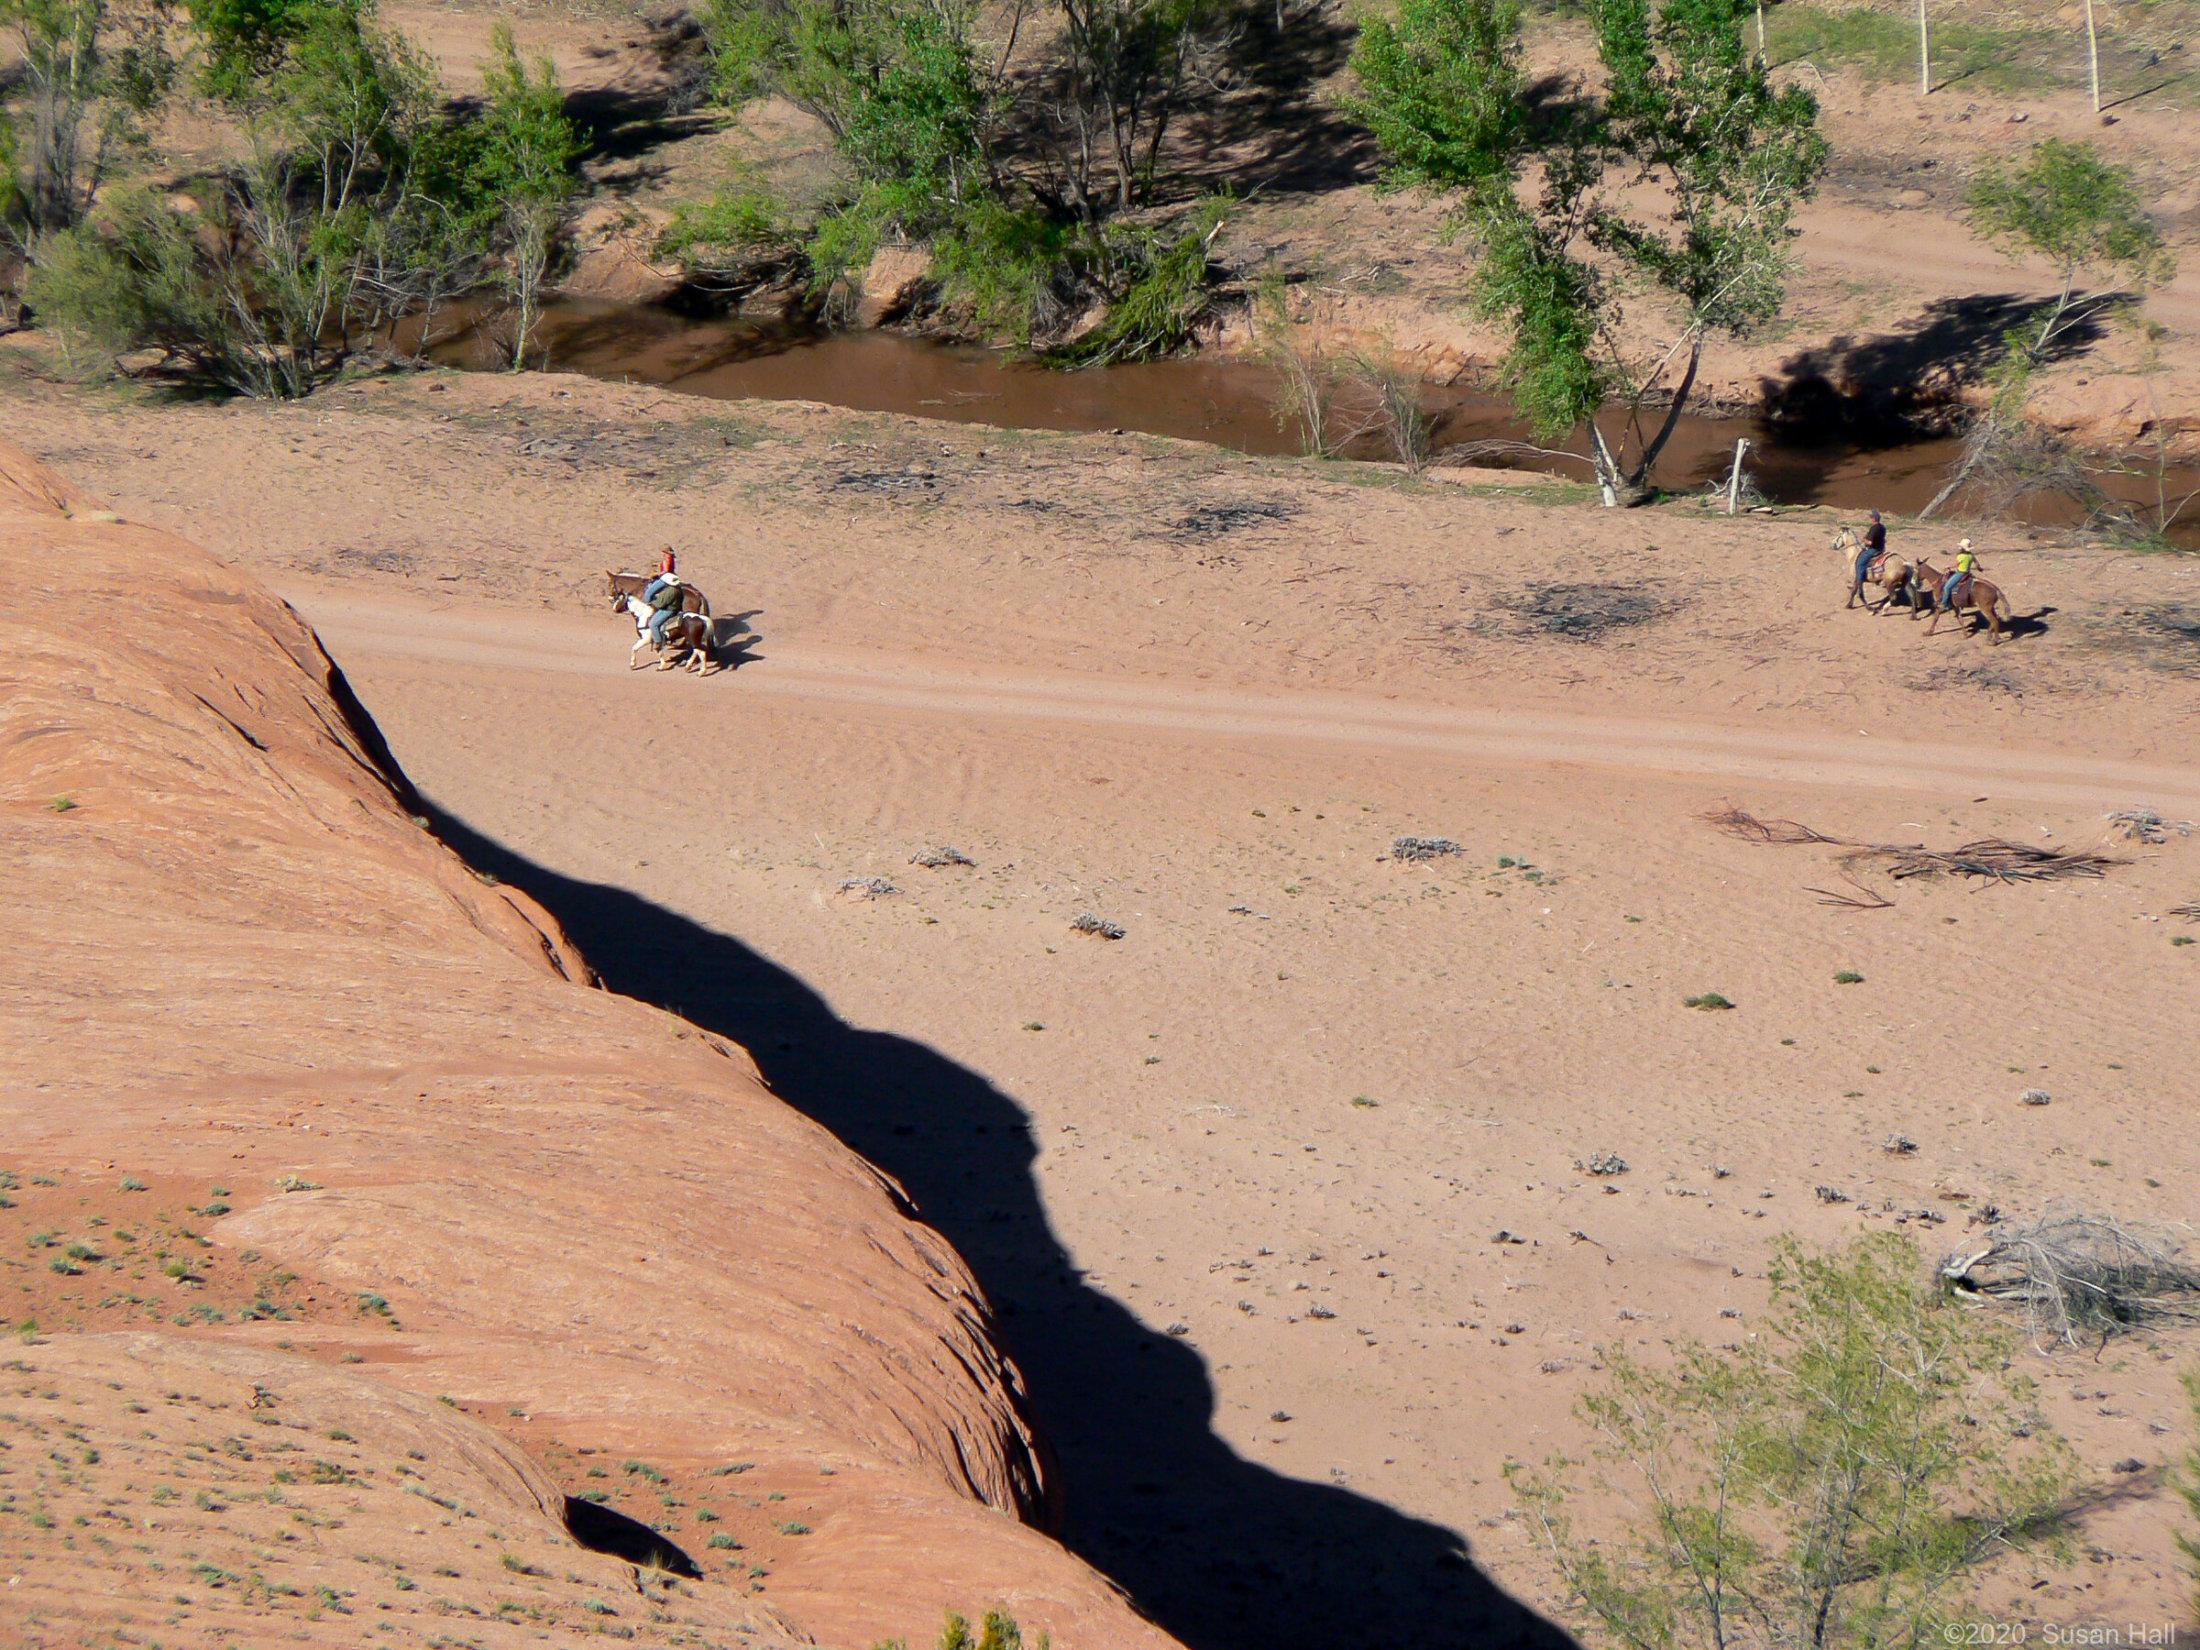 Horseback tour of the canyon